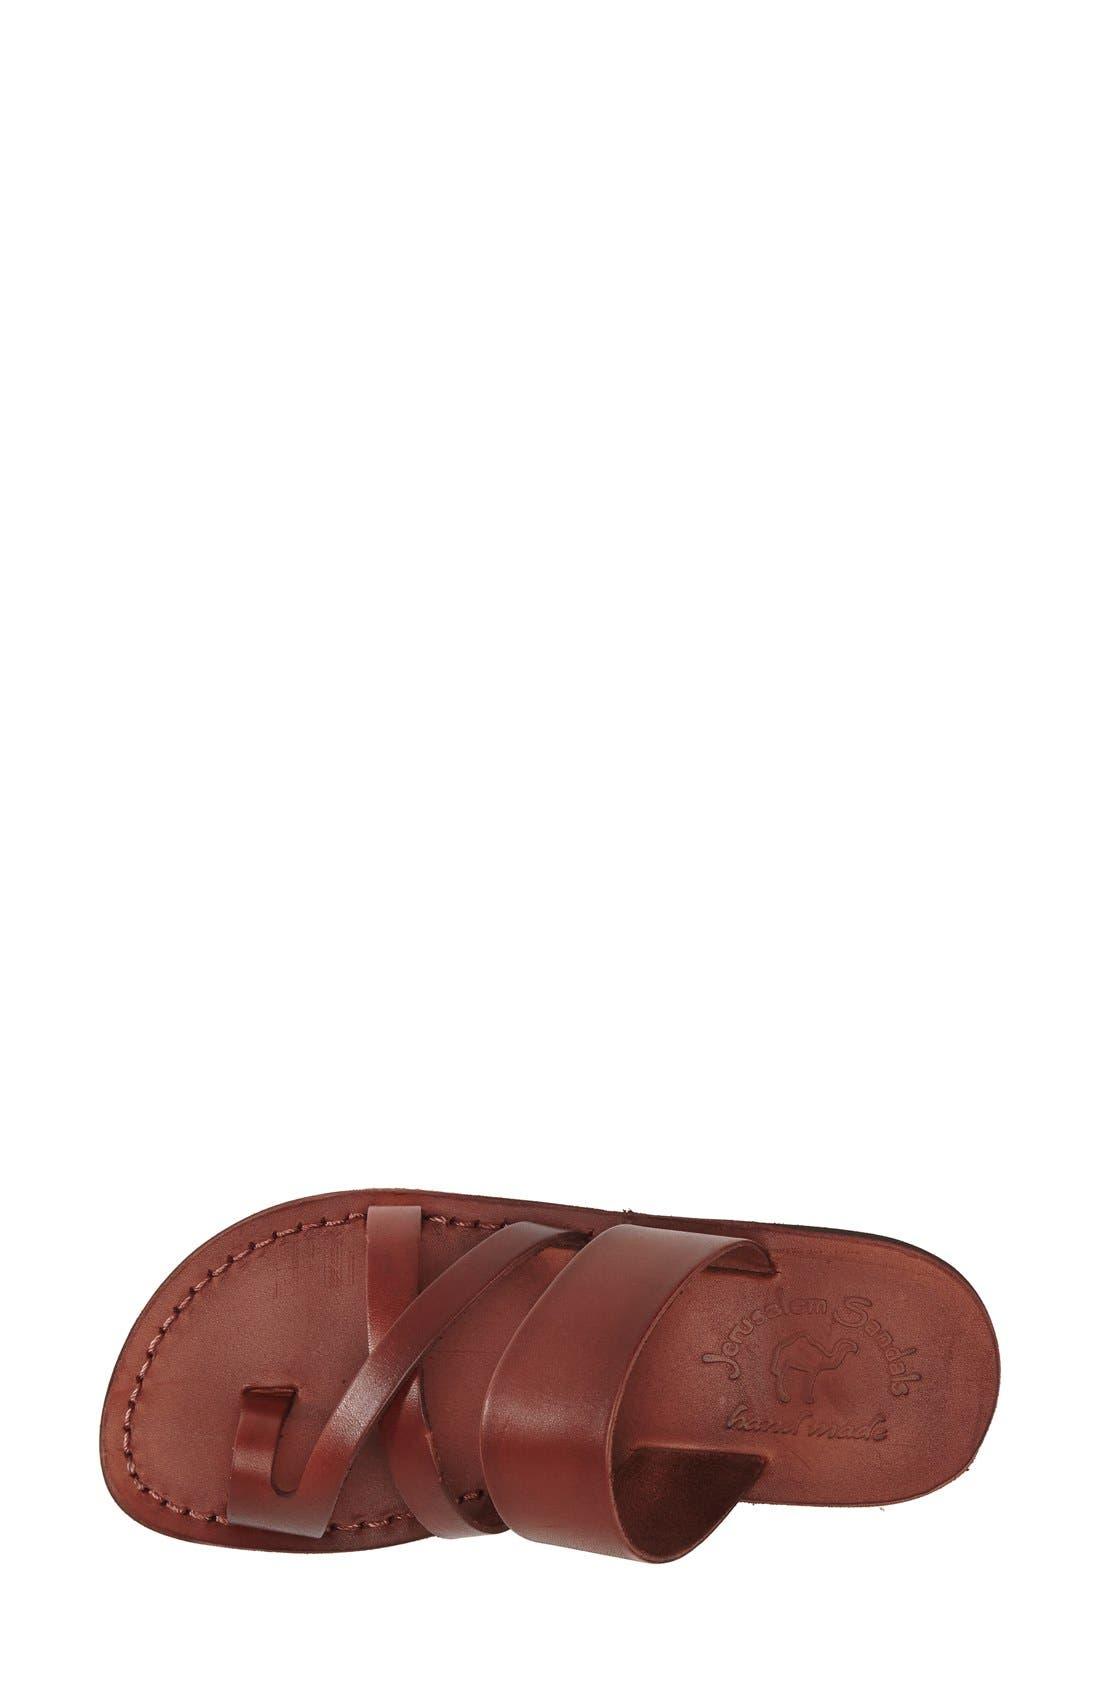 'The Good Shepard' Leather Sandal,                             Alternate thumbnail 21, color,